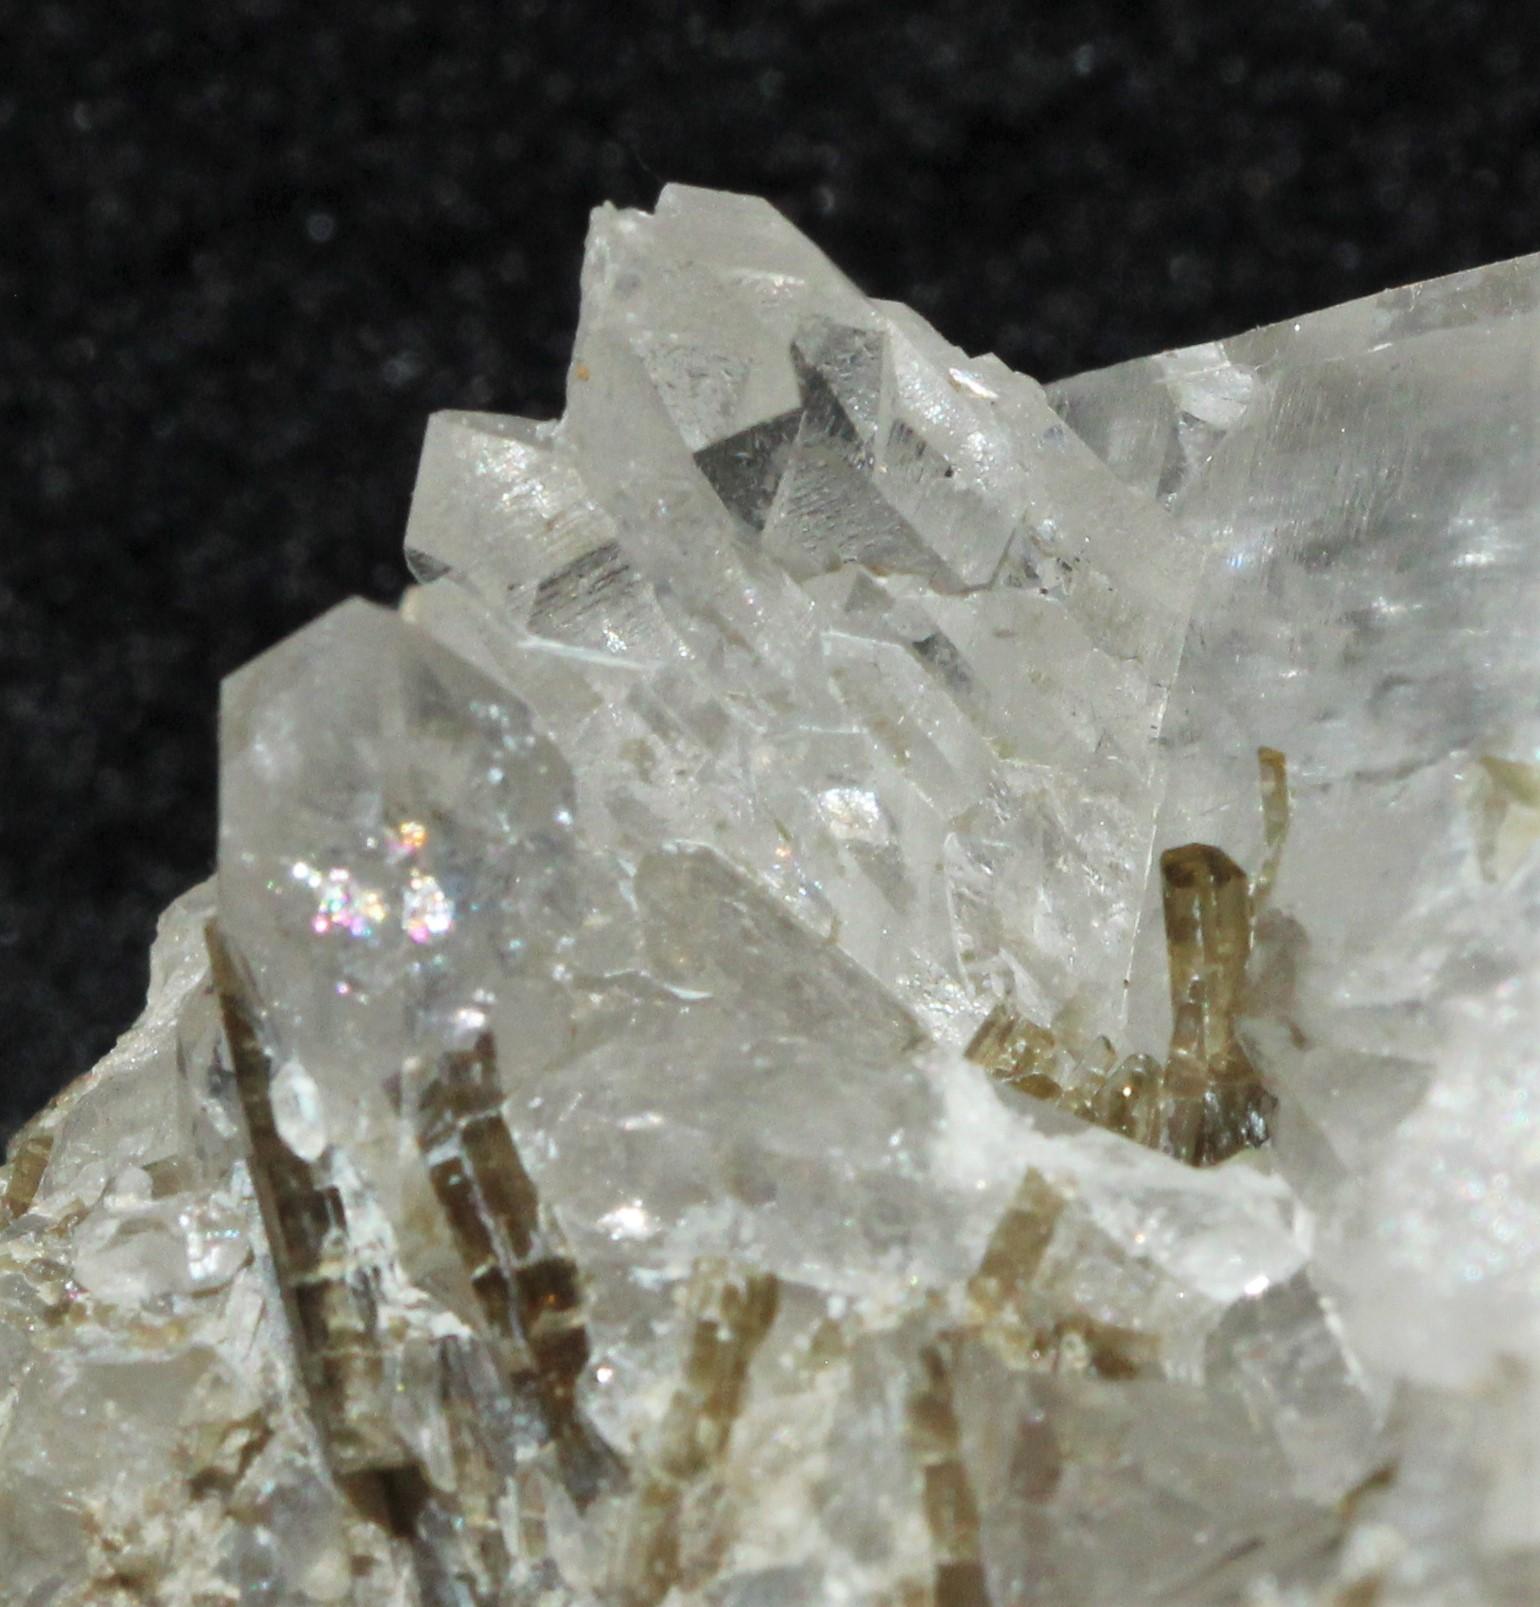 Bergkristall mit Epidot, Val Punteglias (GR)